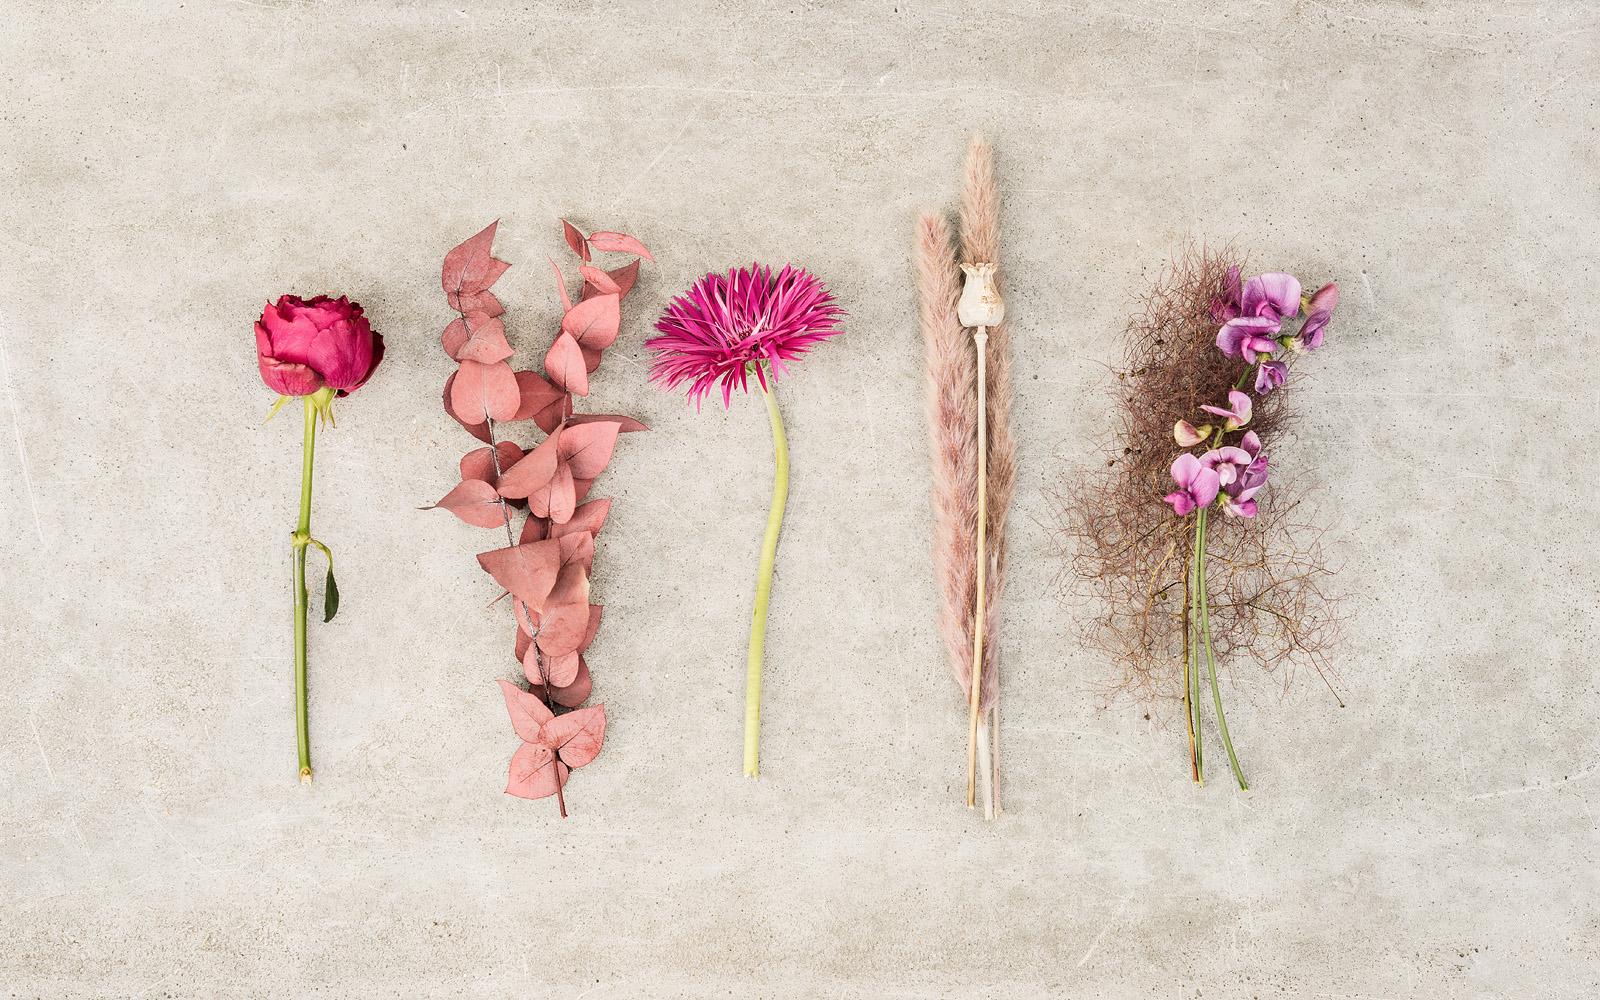 Axel Klodt Flowers